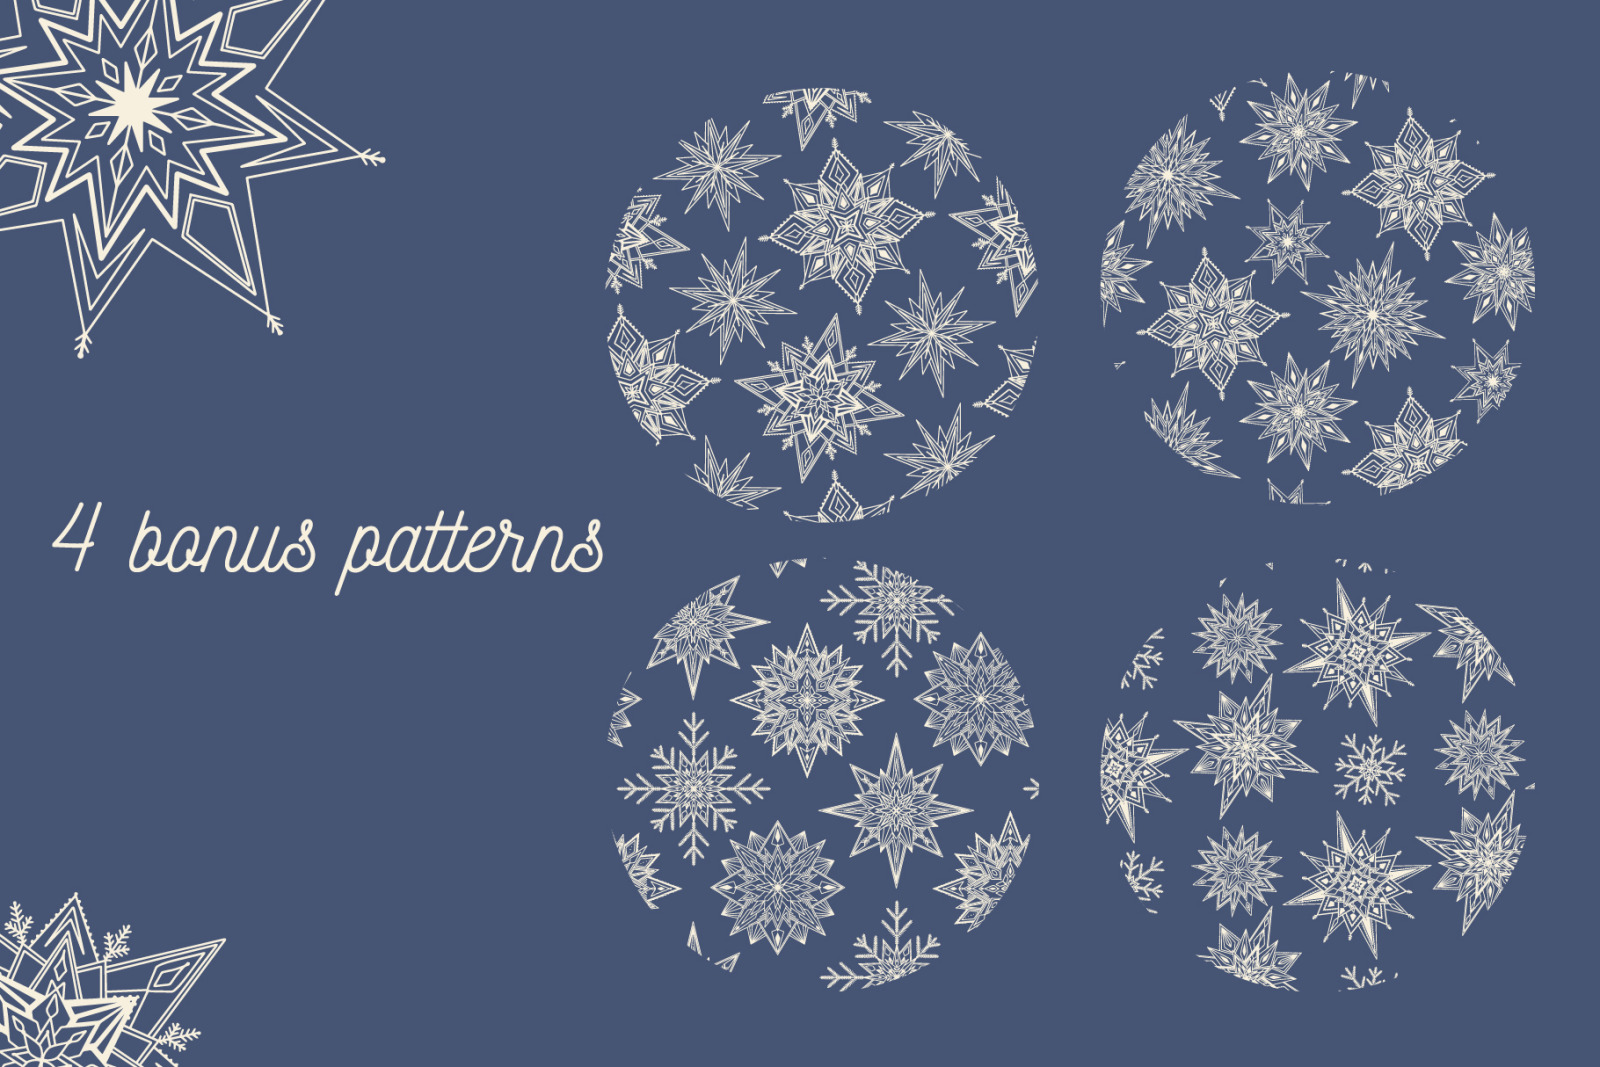 Snowy | 65 snowflakes illustrations